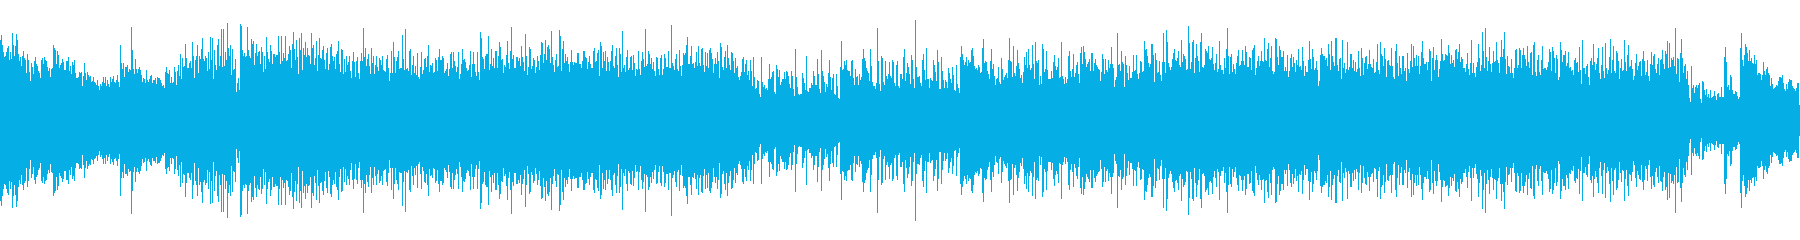 Duelist 60秒の再生済みの波形